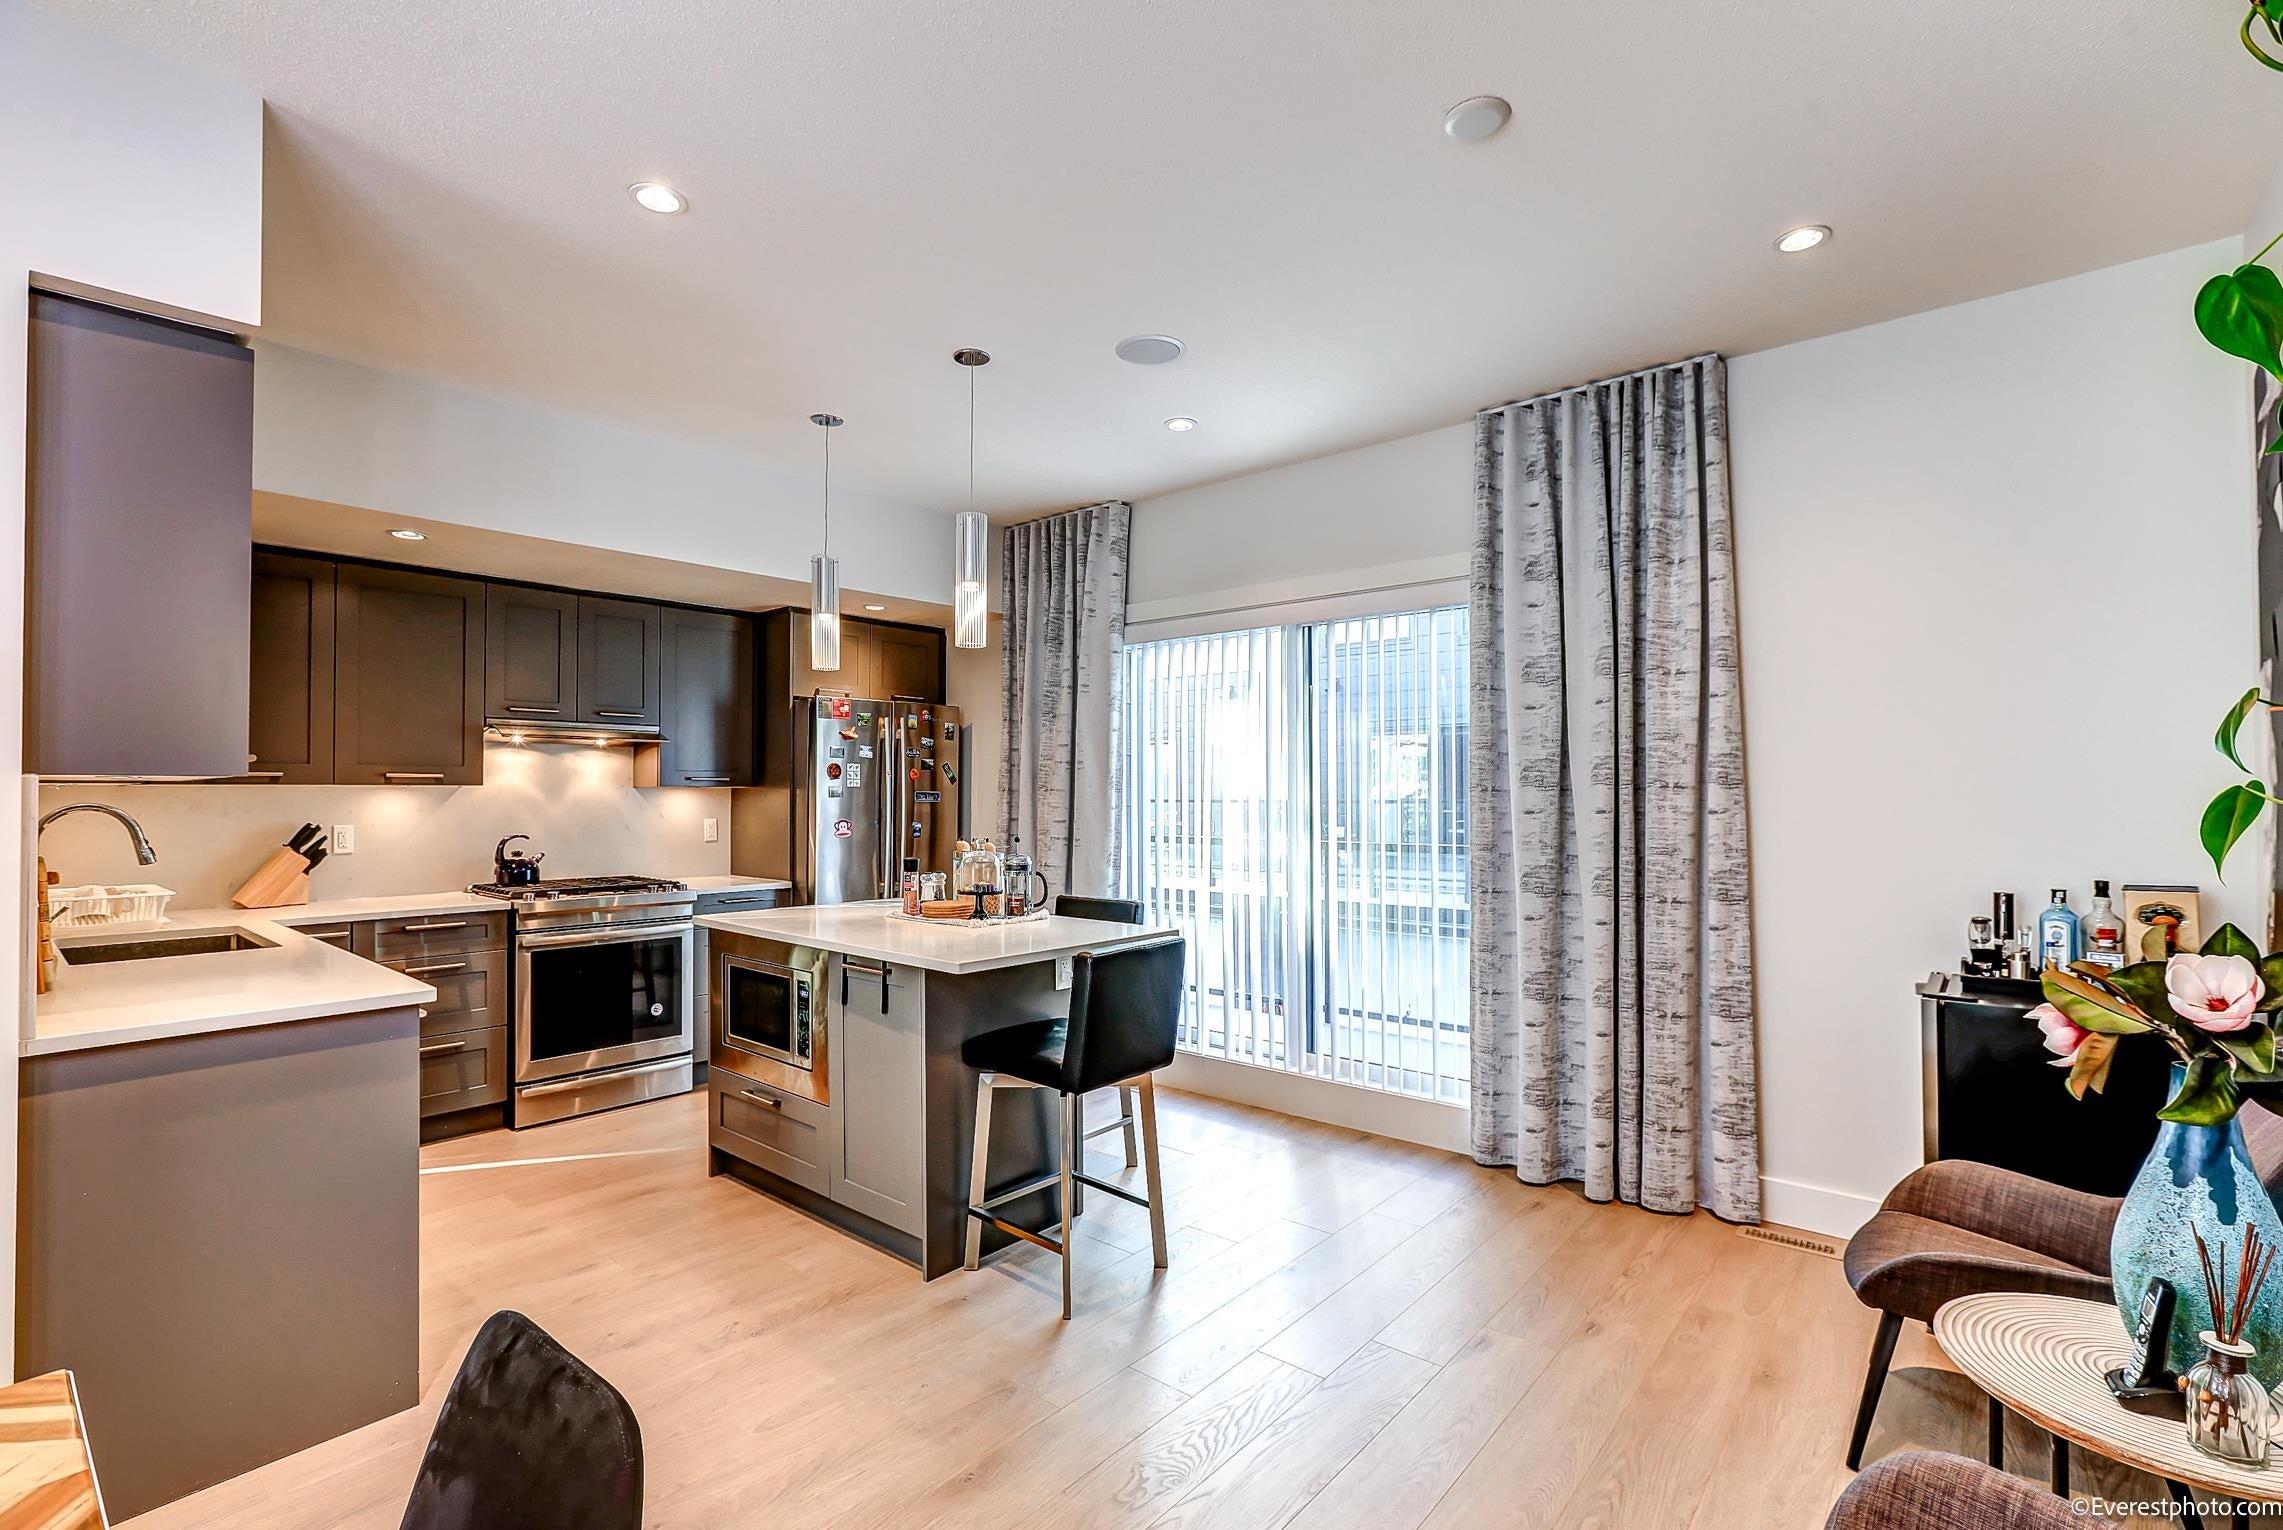 186 2277 OAK MEADOWS DRIVE - Grandview Surrey Townhouse for sale, 3 Bedrooms (R2624950) - #7